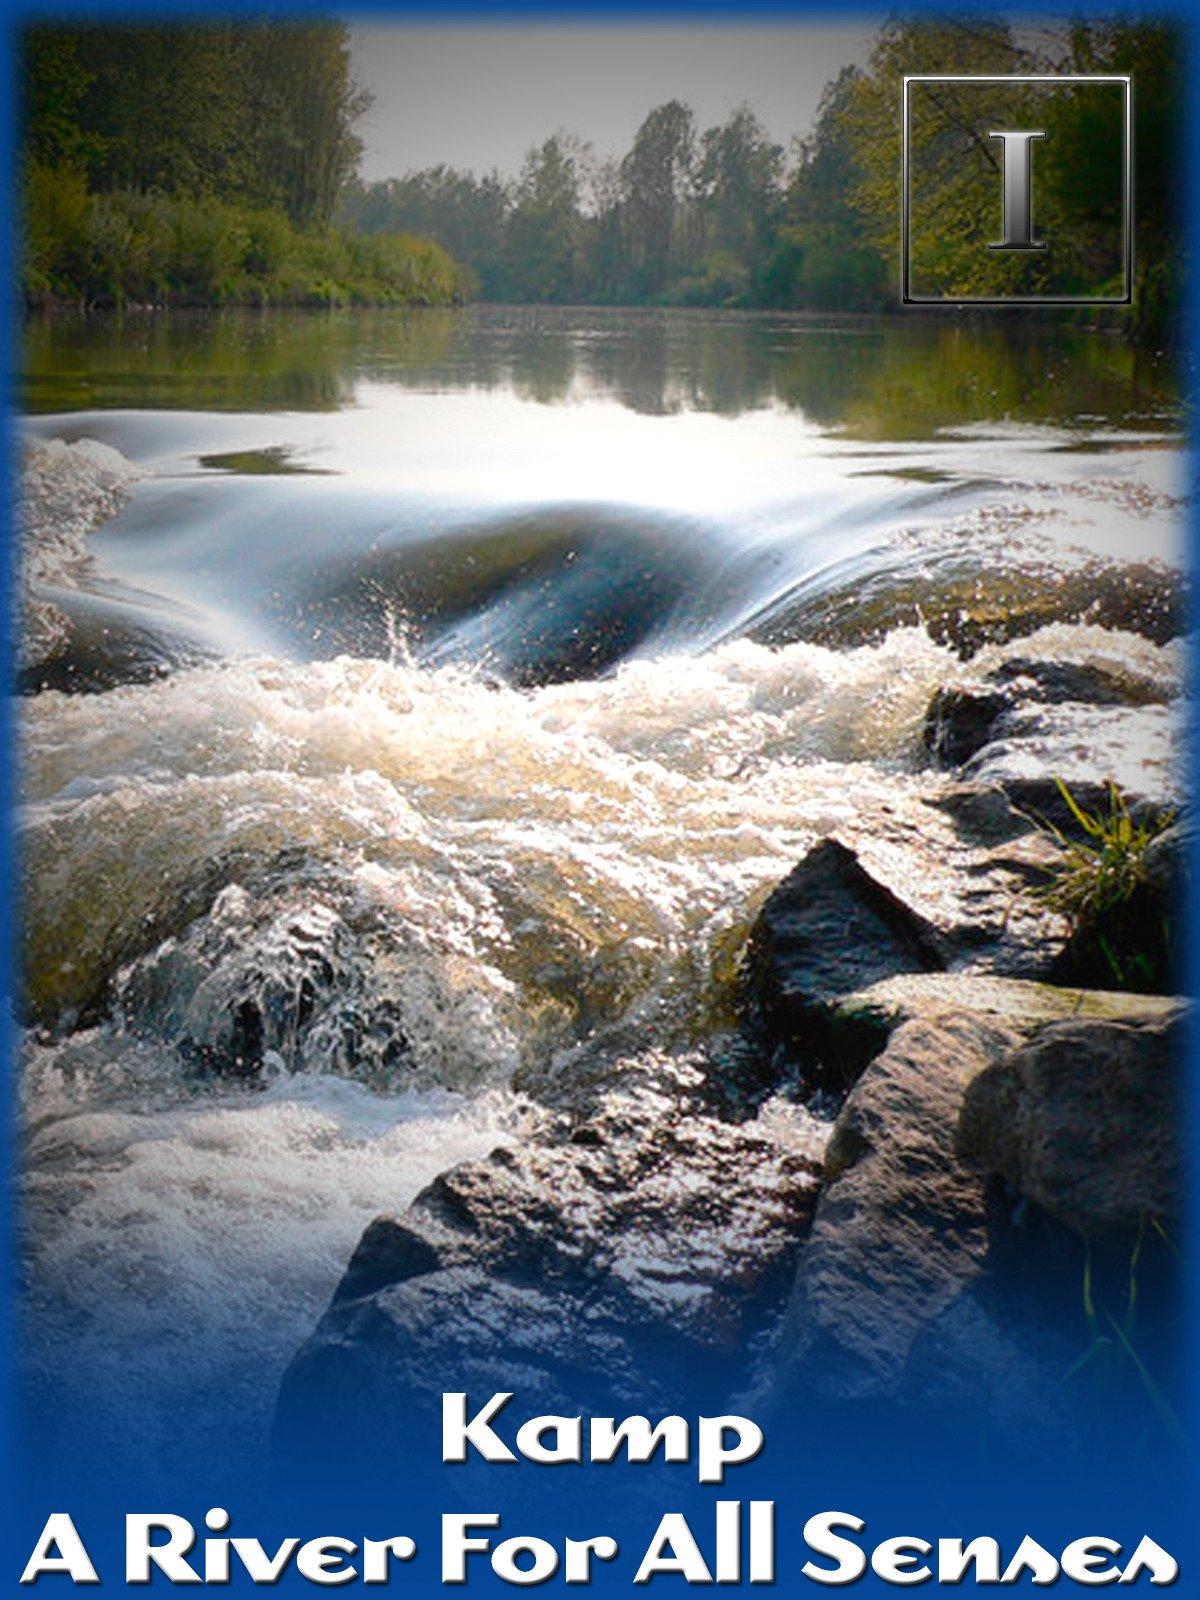 Kamp - A River for all Senses